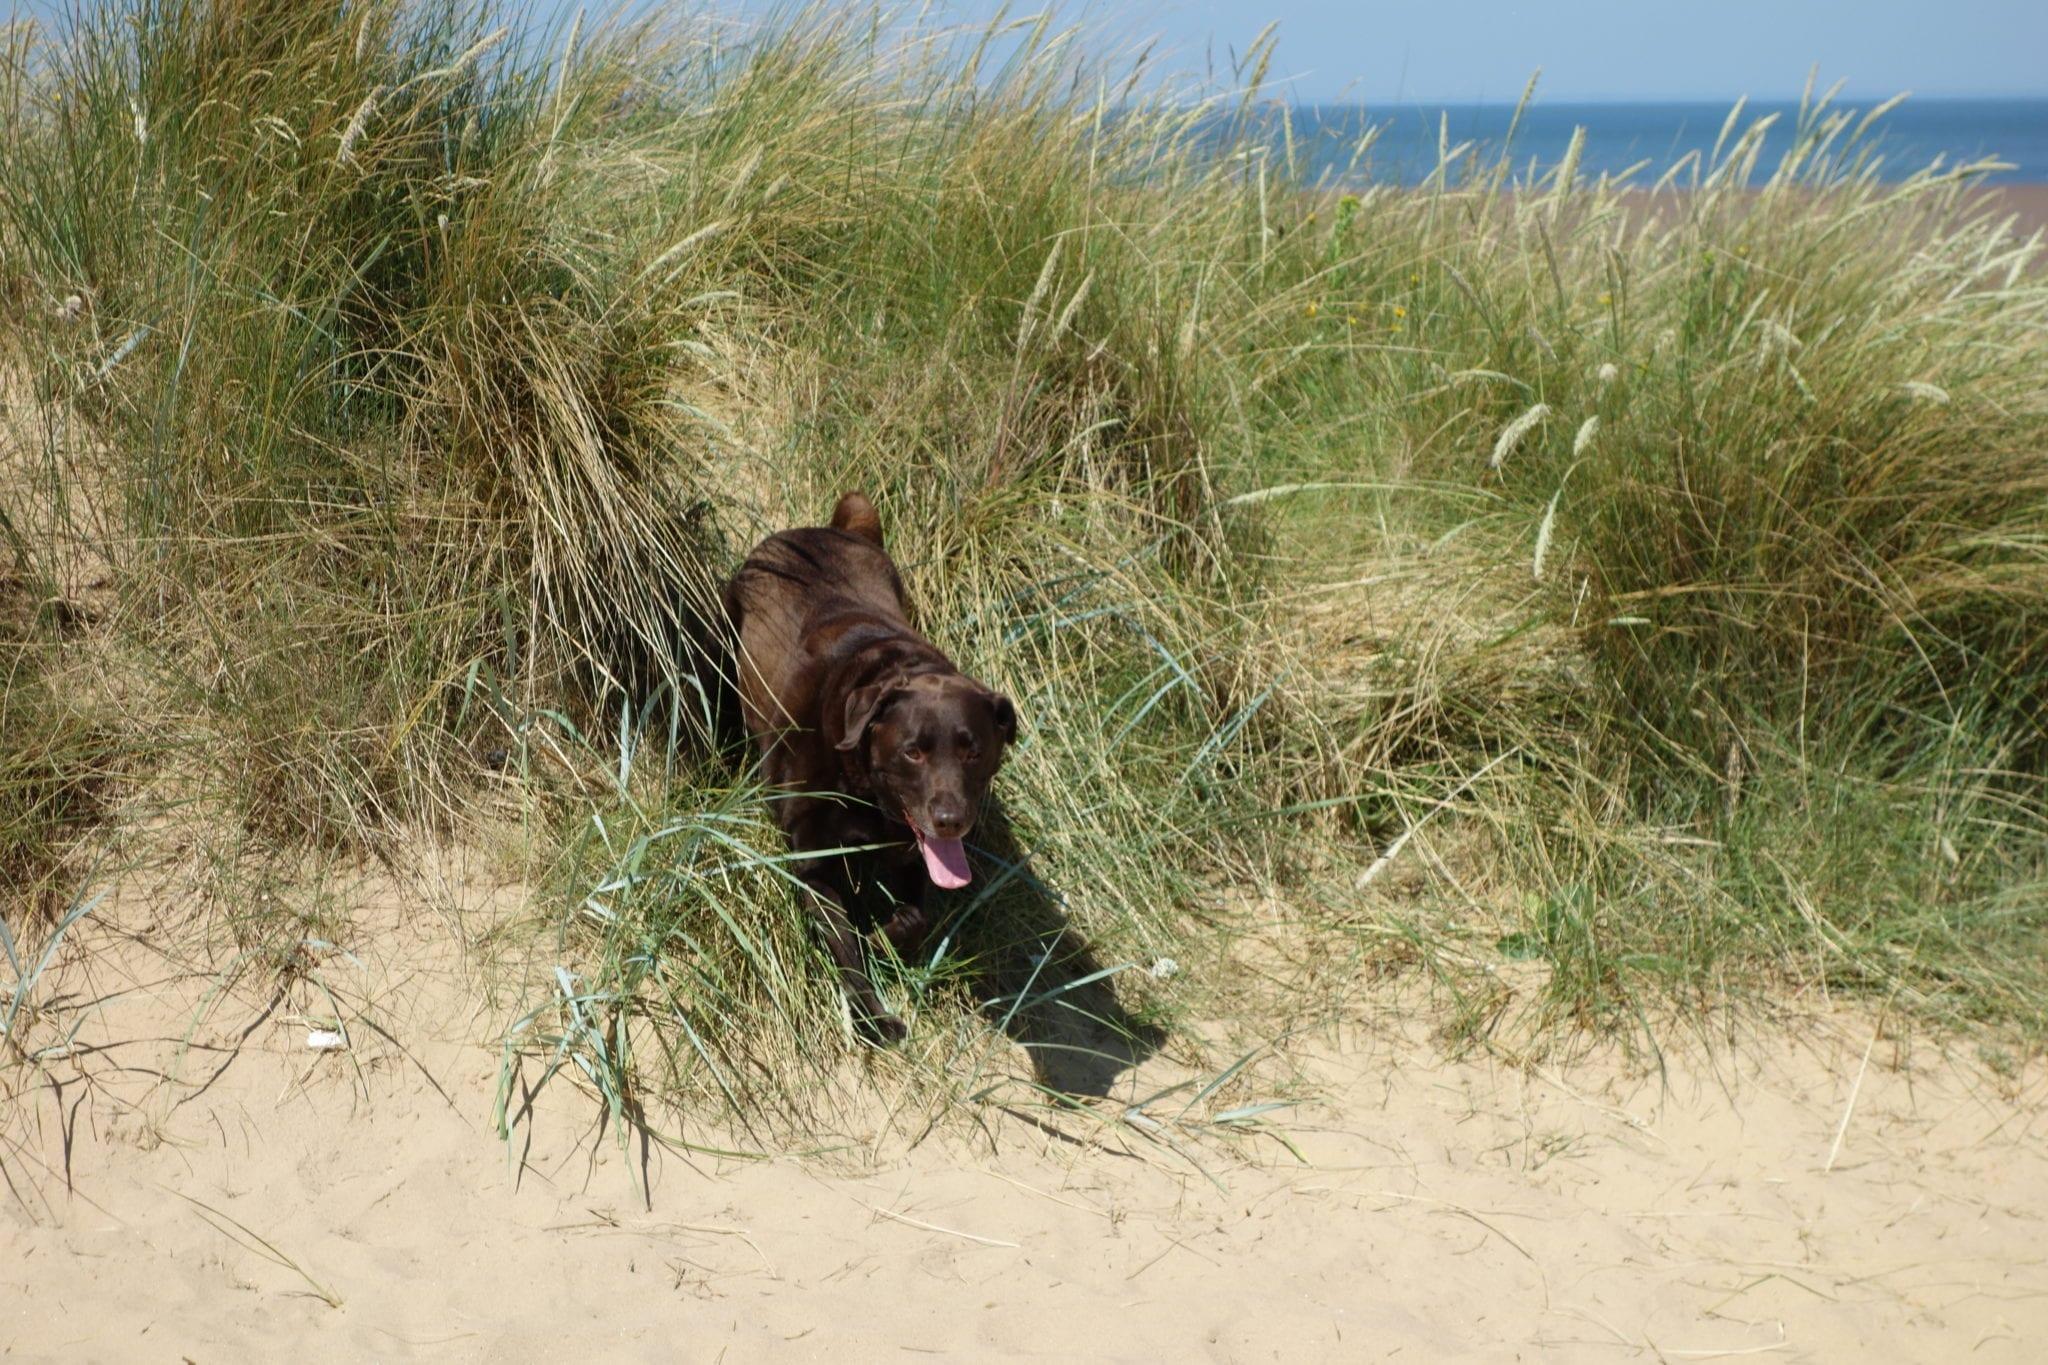 Dog at beach near Caley Hall Hotel,